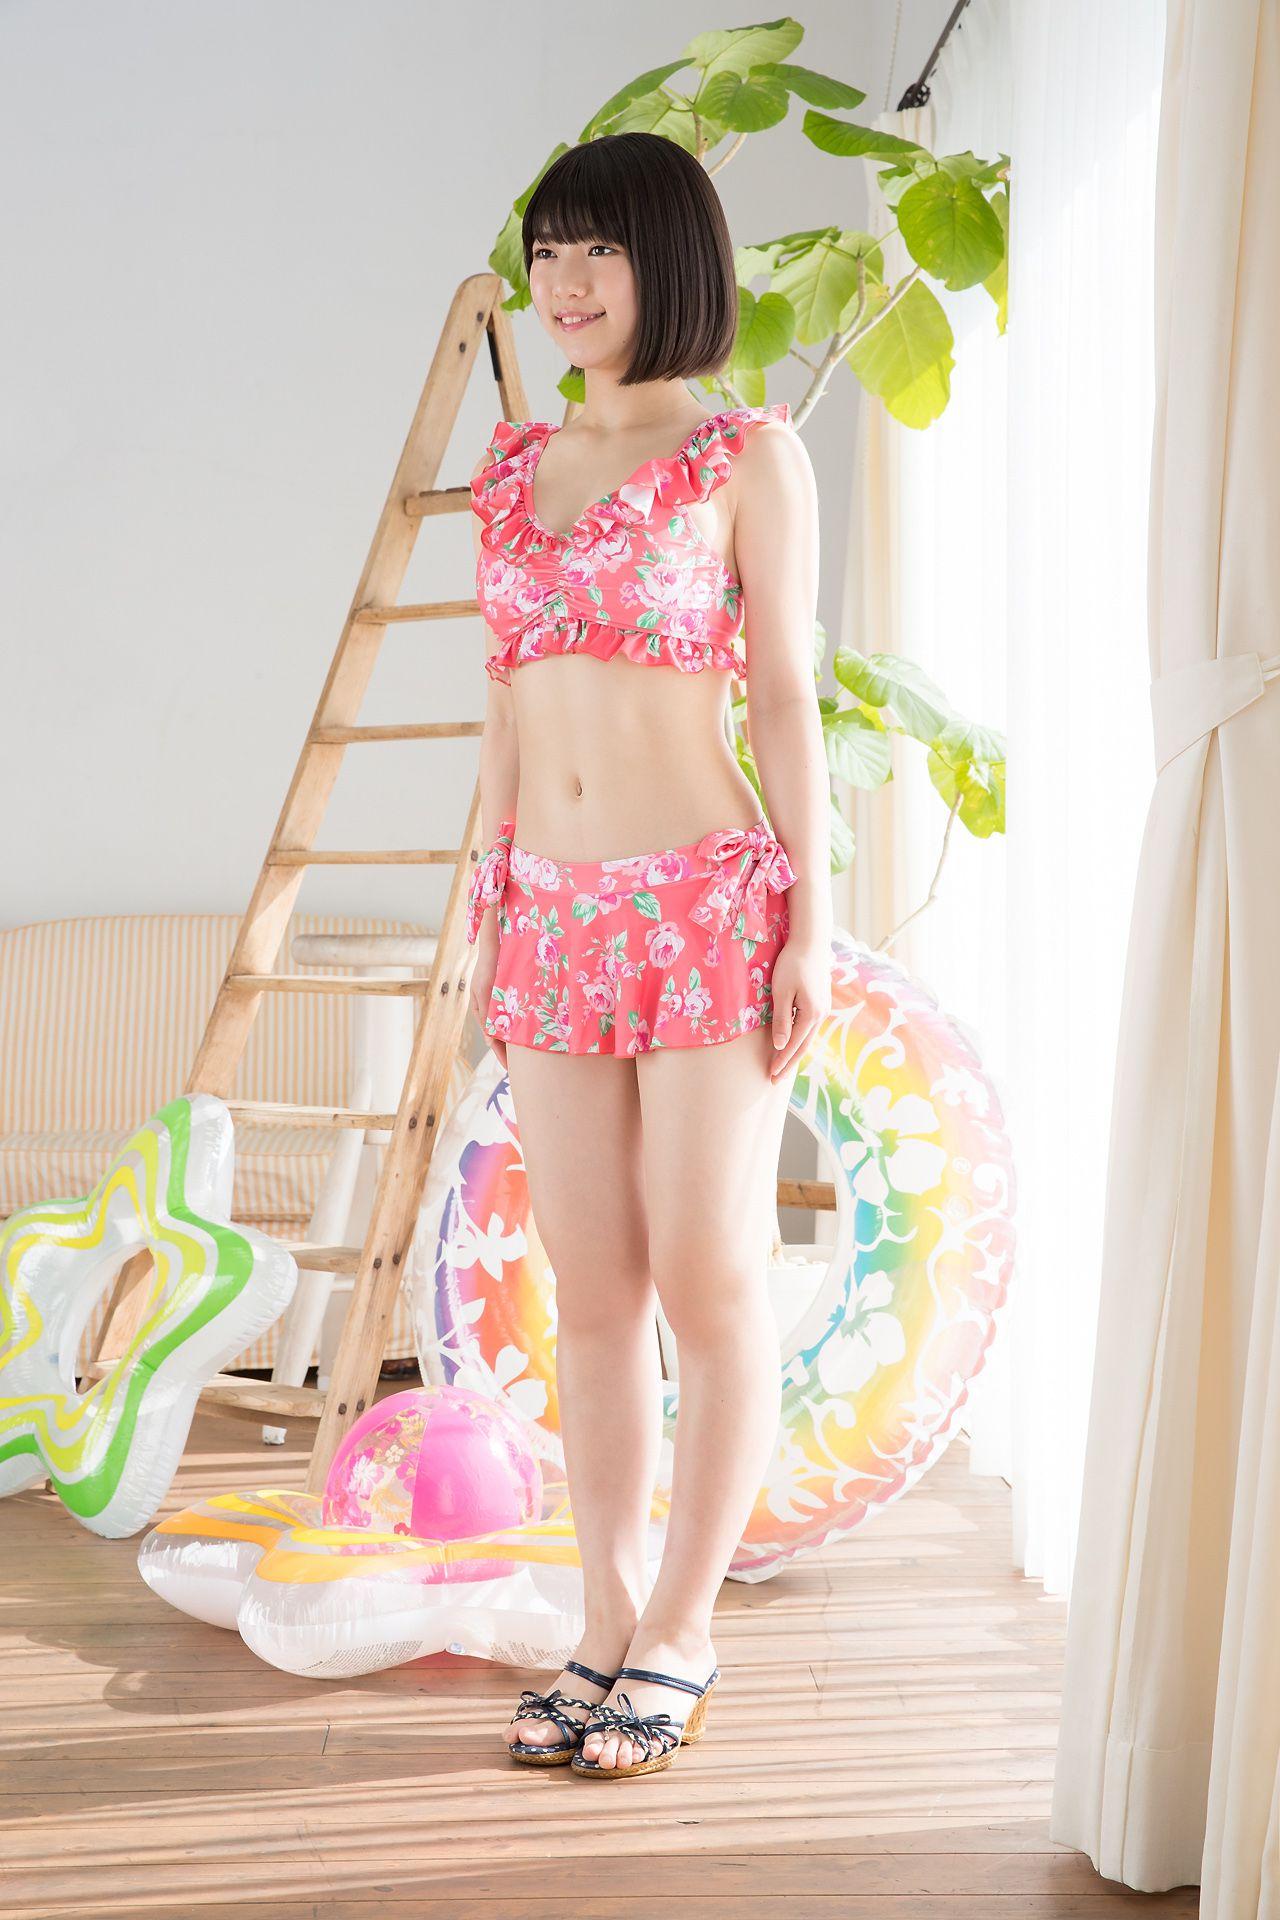 VOL.250 [Minisuka.tv]泳装萌女:沢村りさ超高清写真套图(50P)